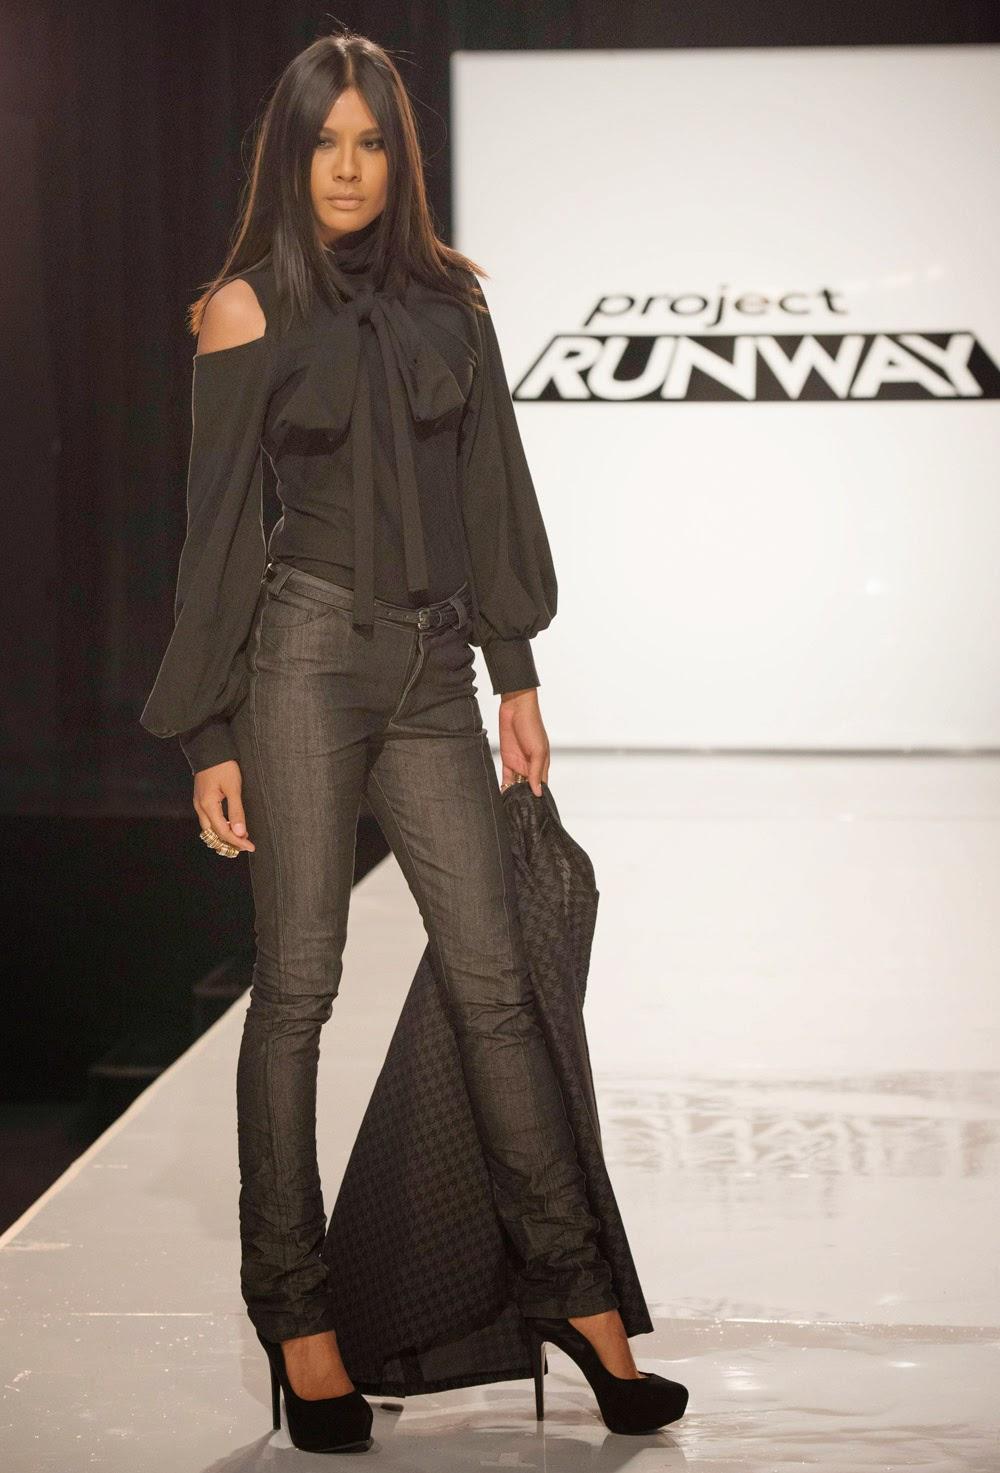 Tirare Le Fila Project Runway Season 13 Episode 3 Back